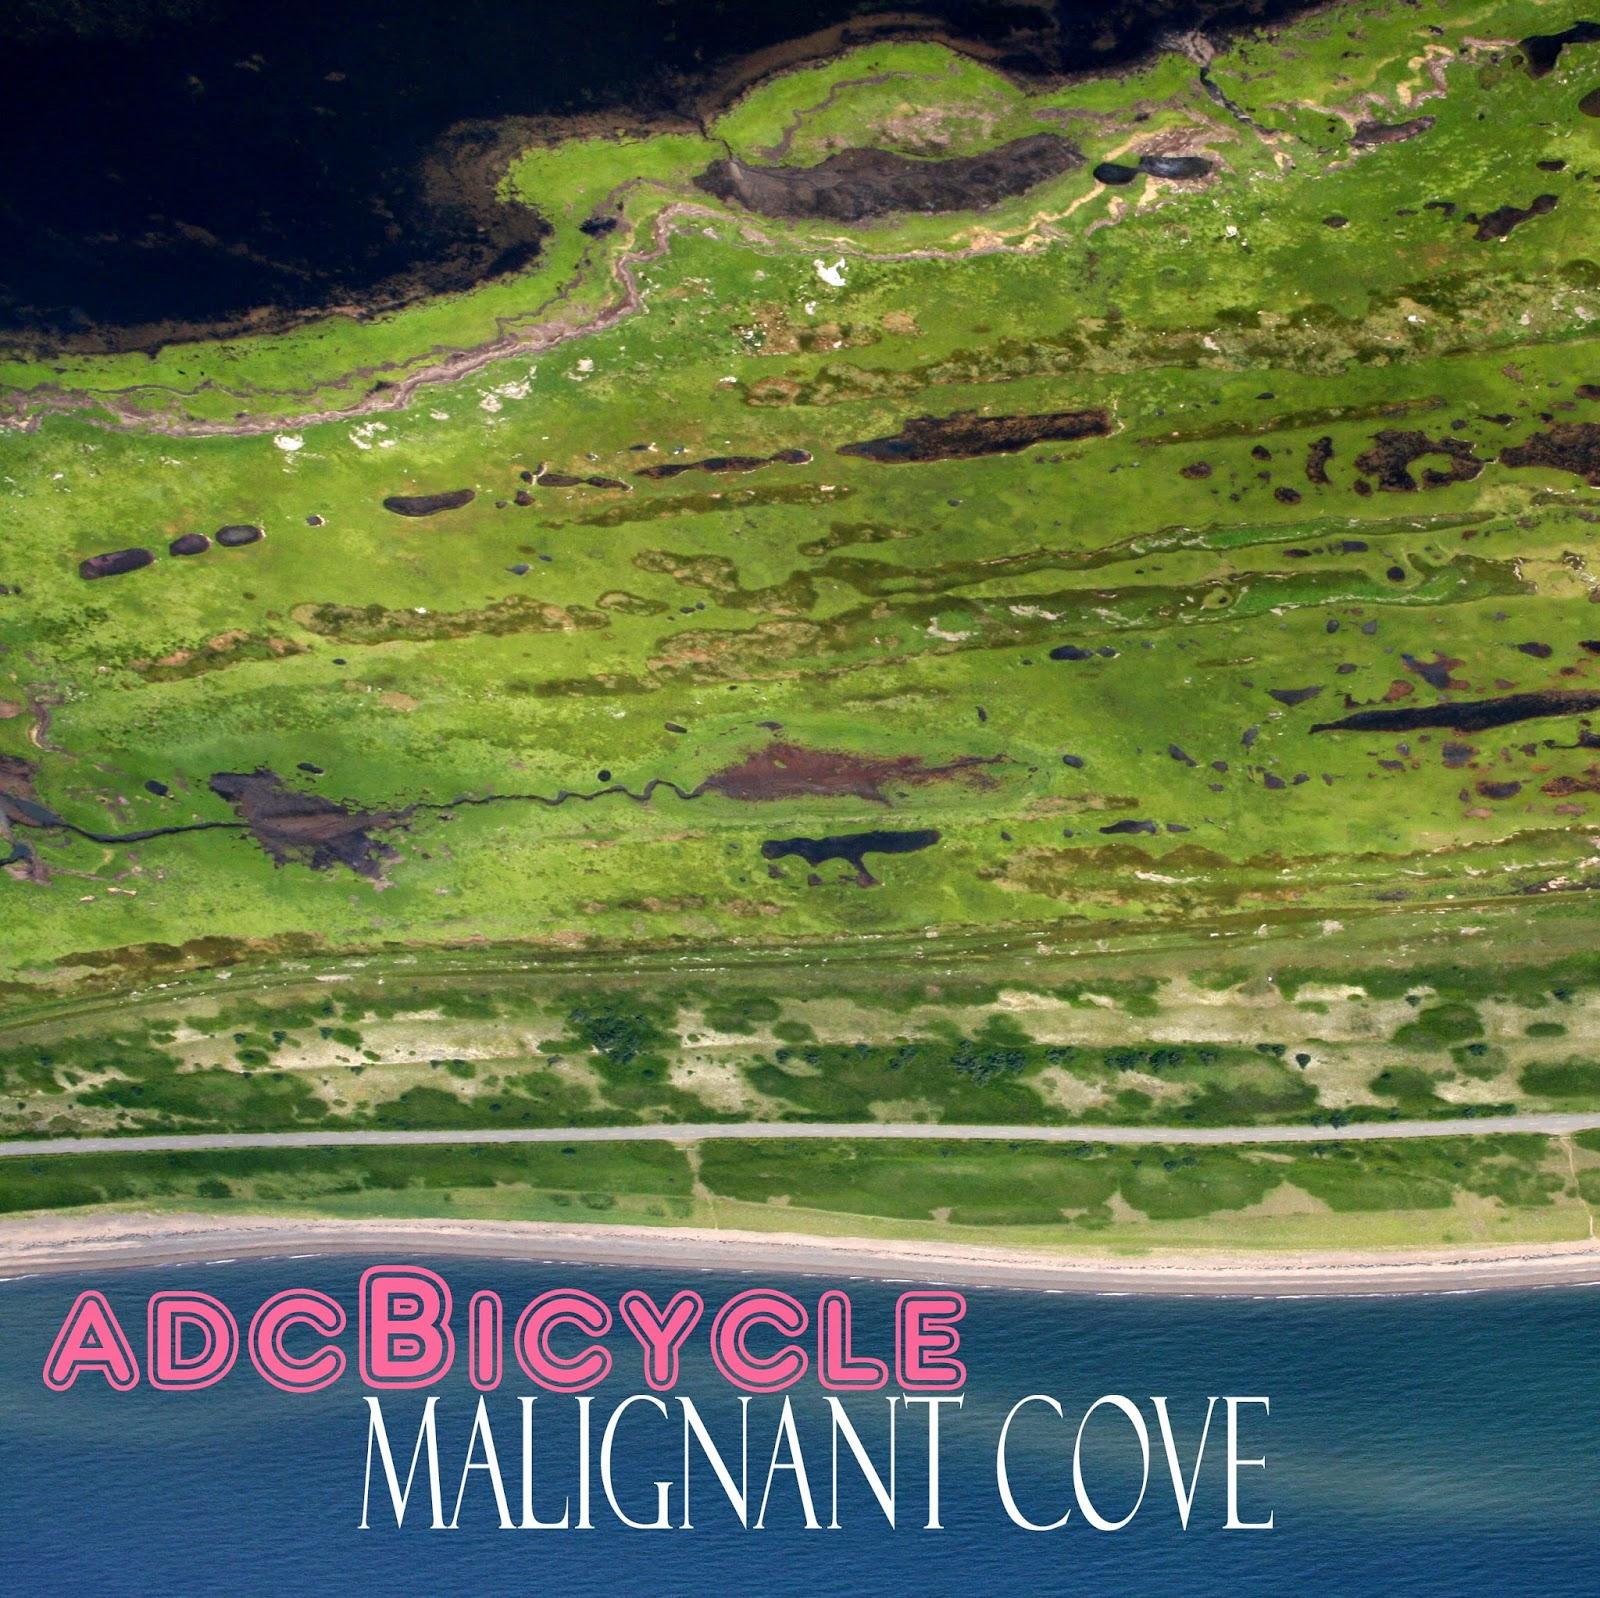 https://adcbicycle.bandcamp.com/album/malignant-cove